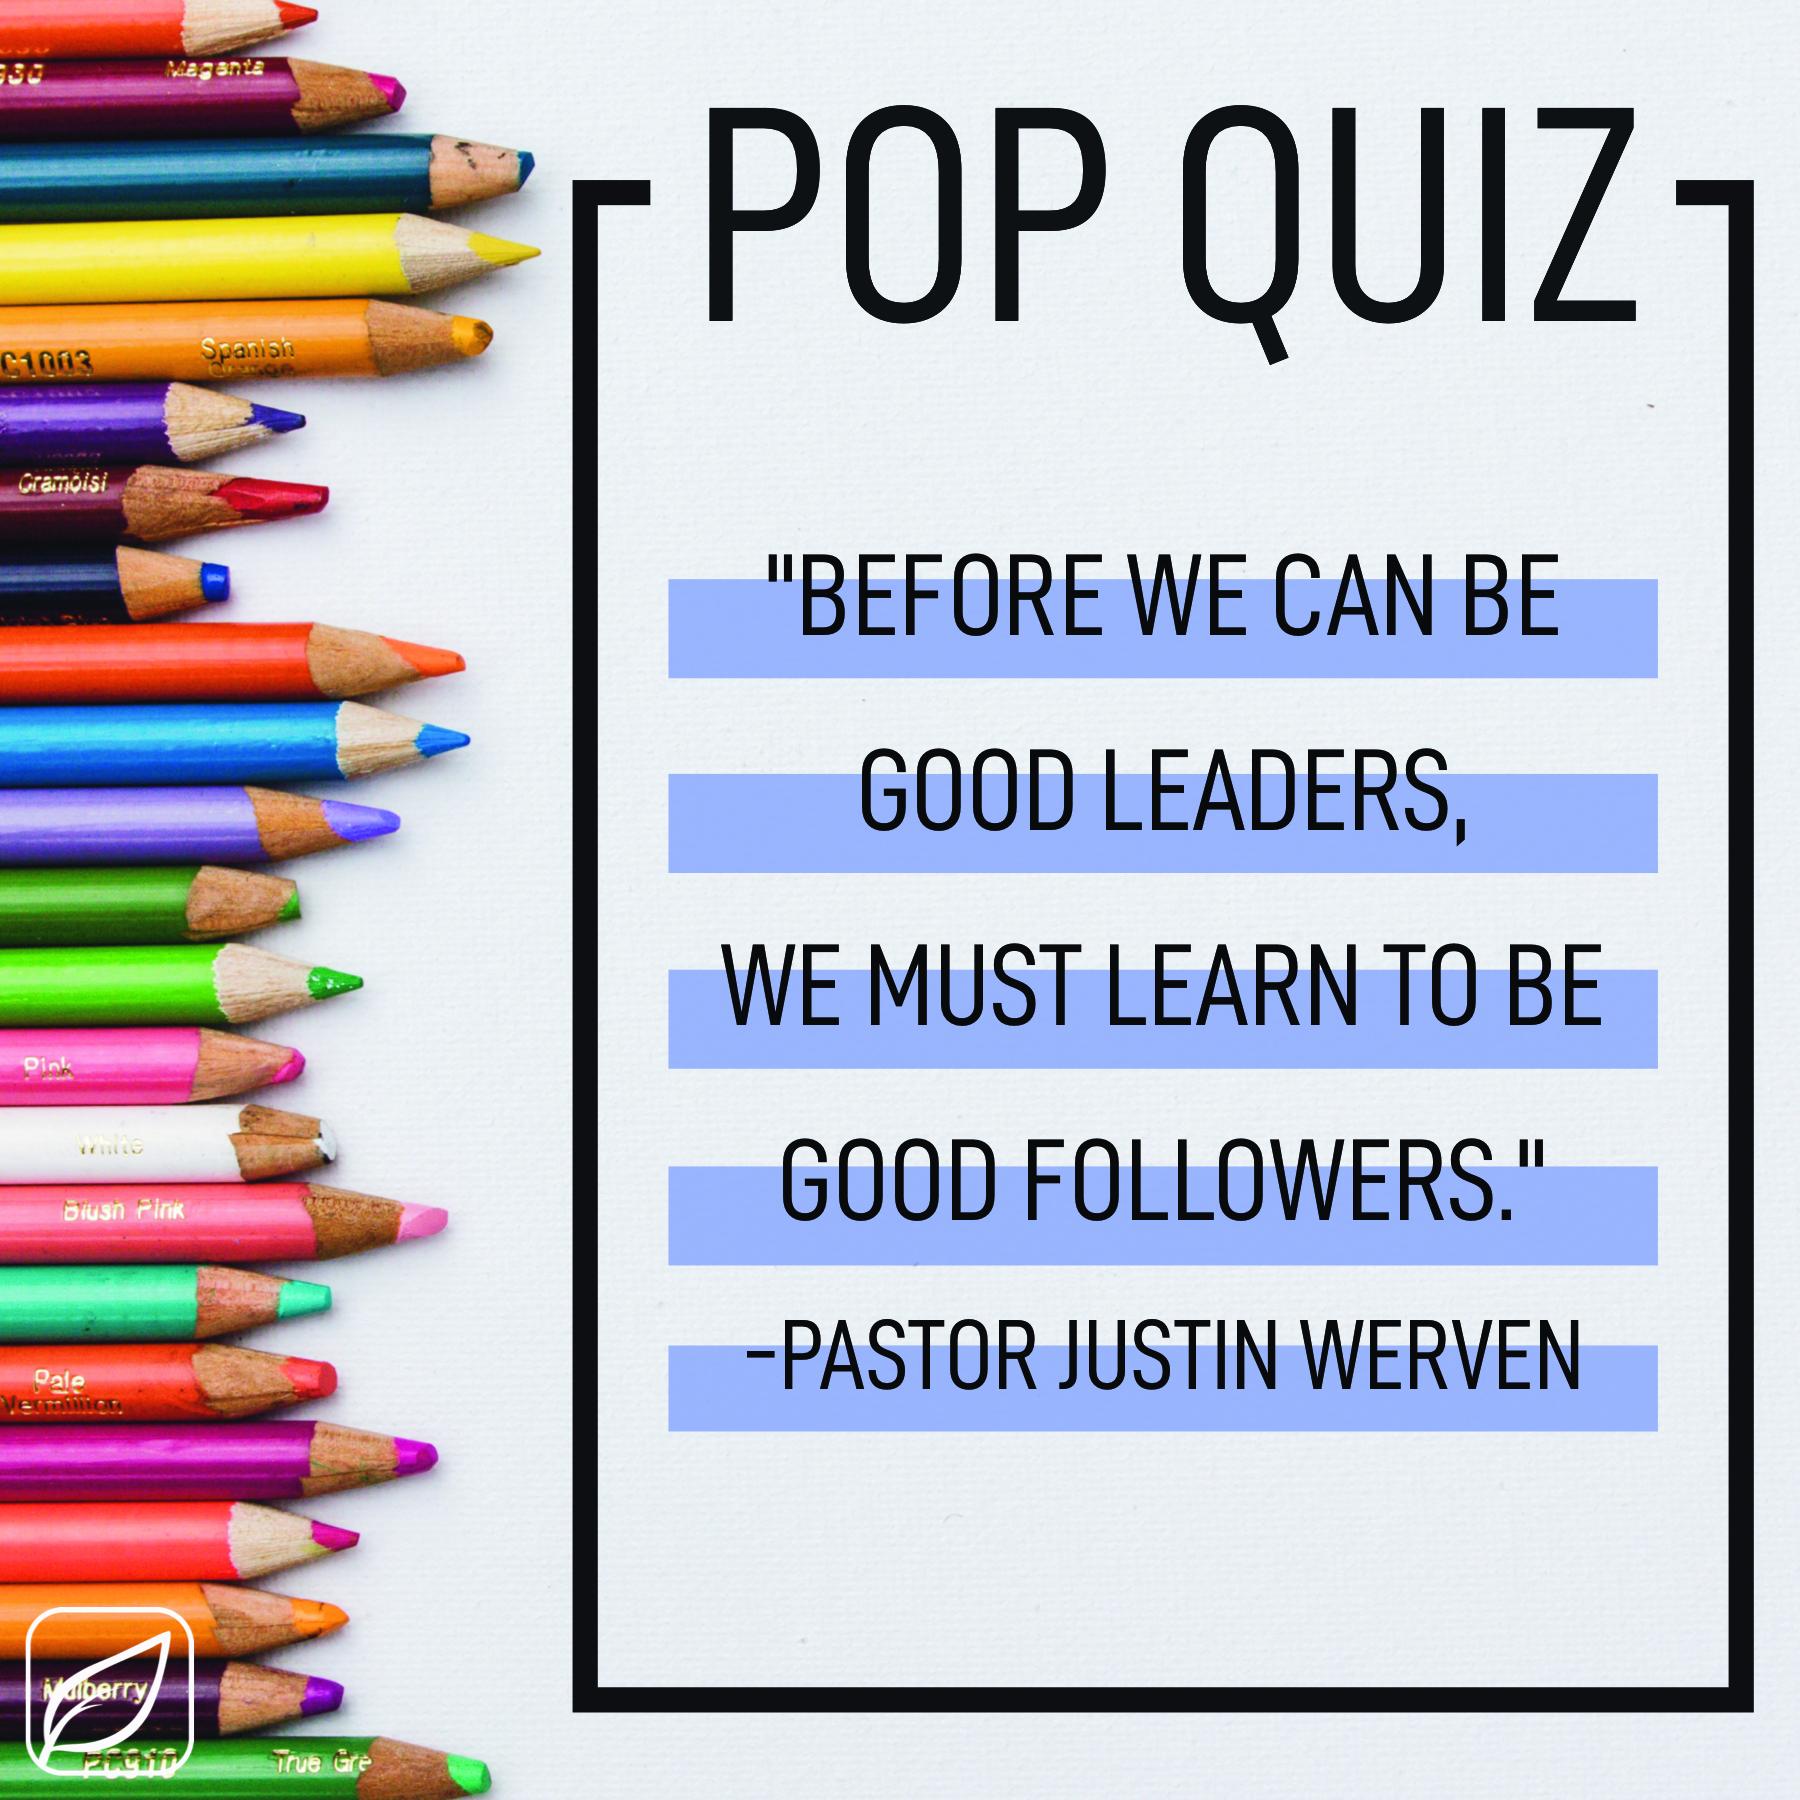 Pop Quiz Blog Graphic - Authority.jpg